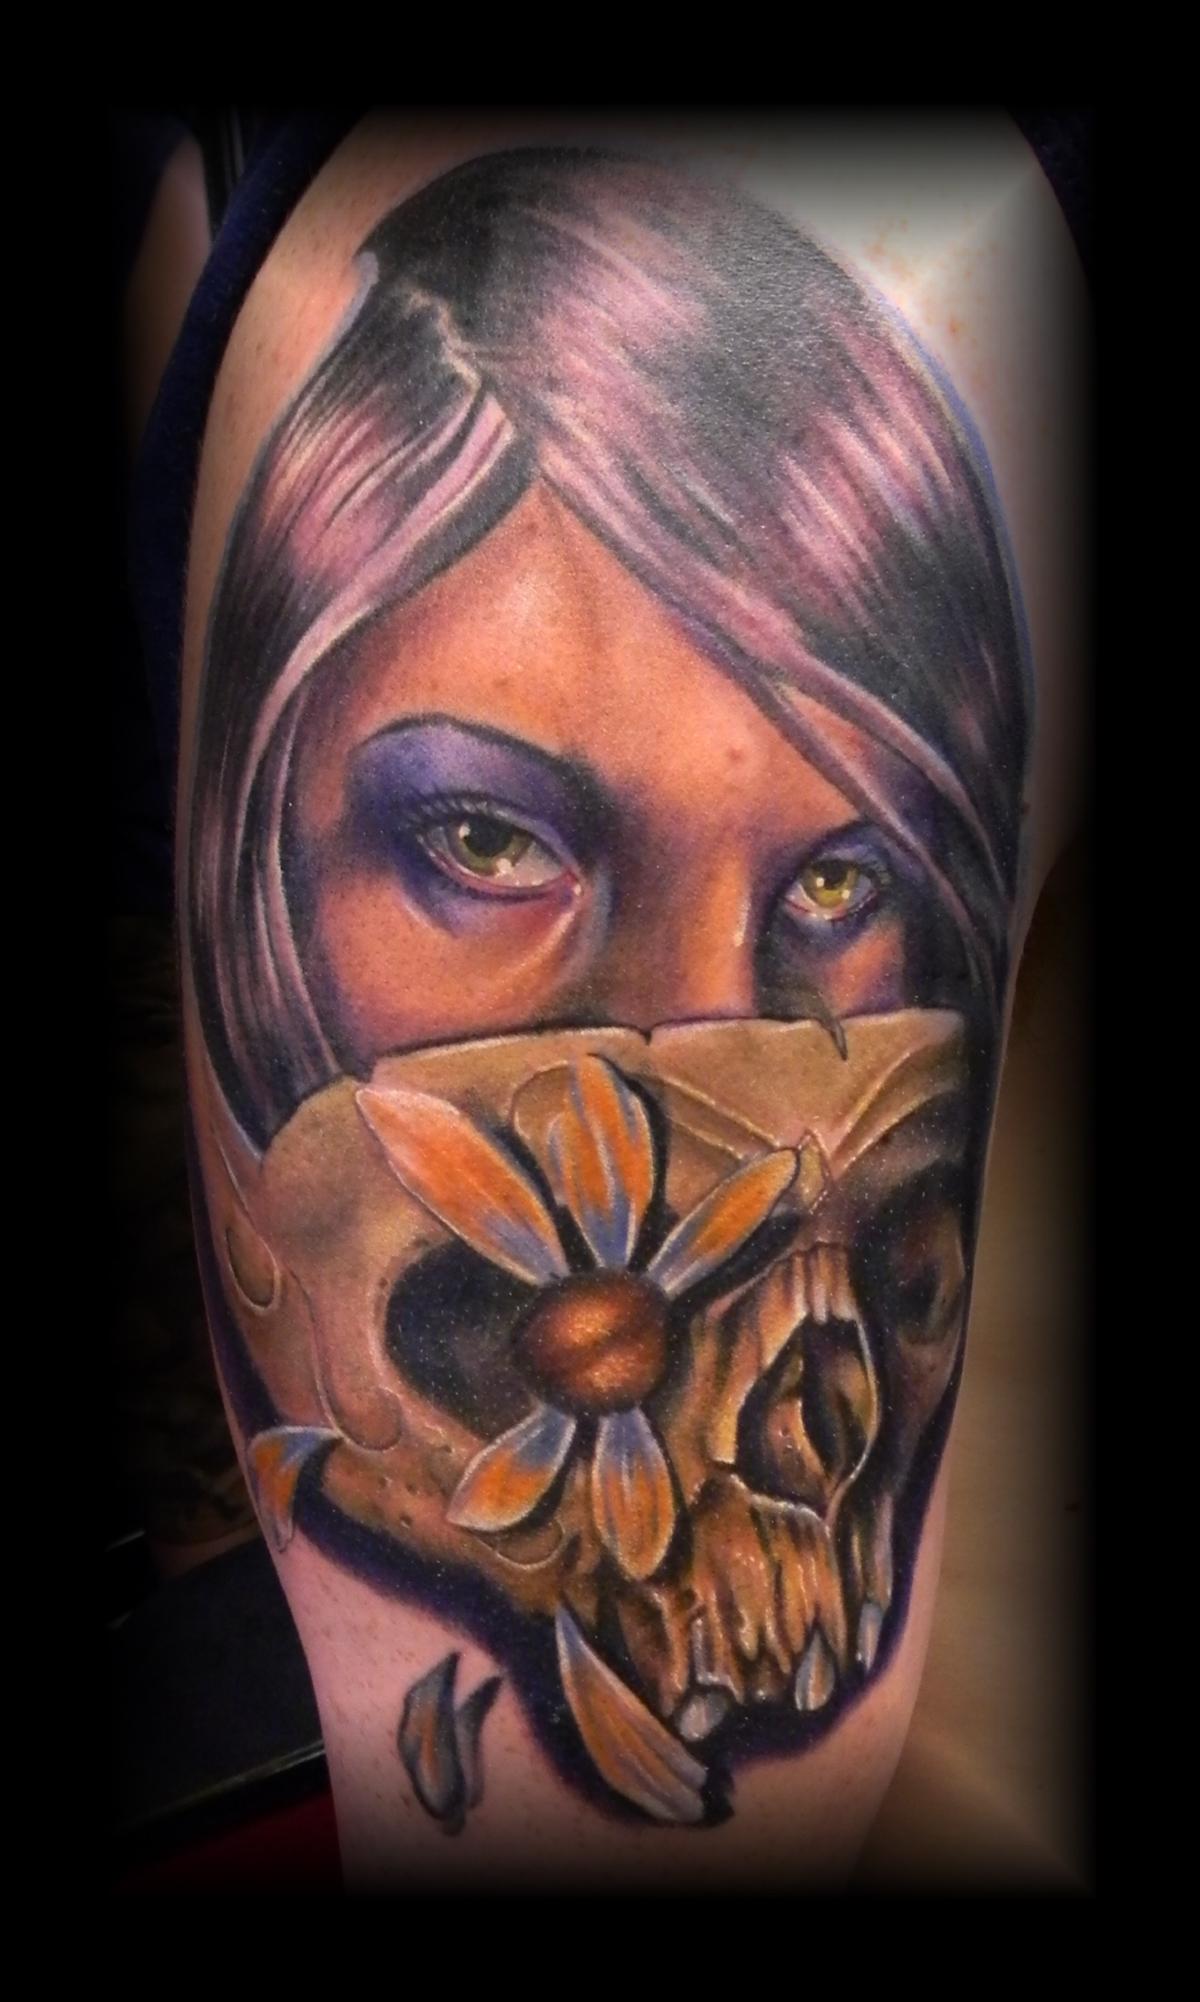 Pin indiana tattoo pix from wicked ways on bob baxters for Wicked ways tattoo